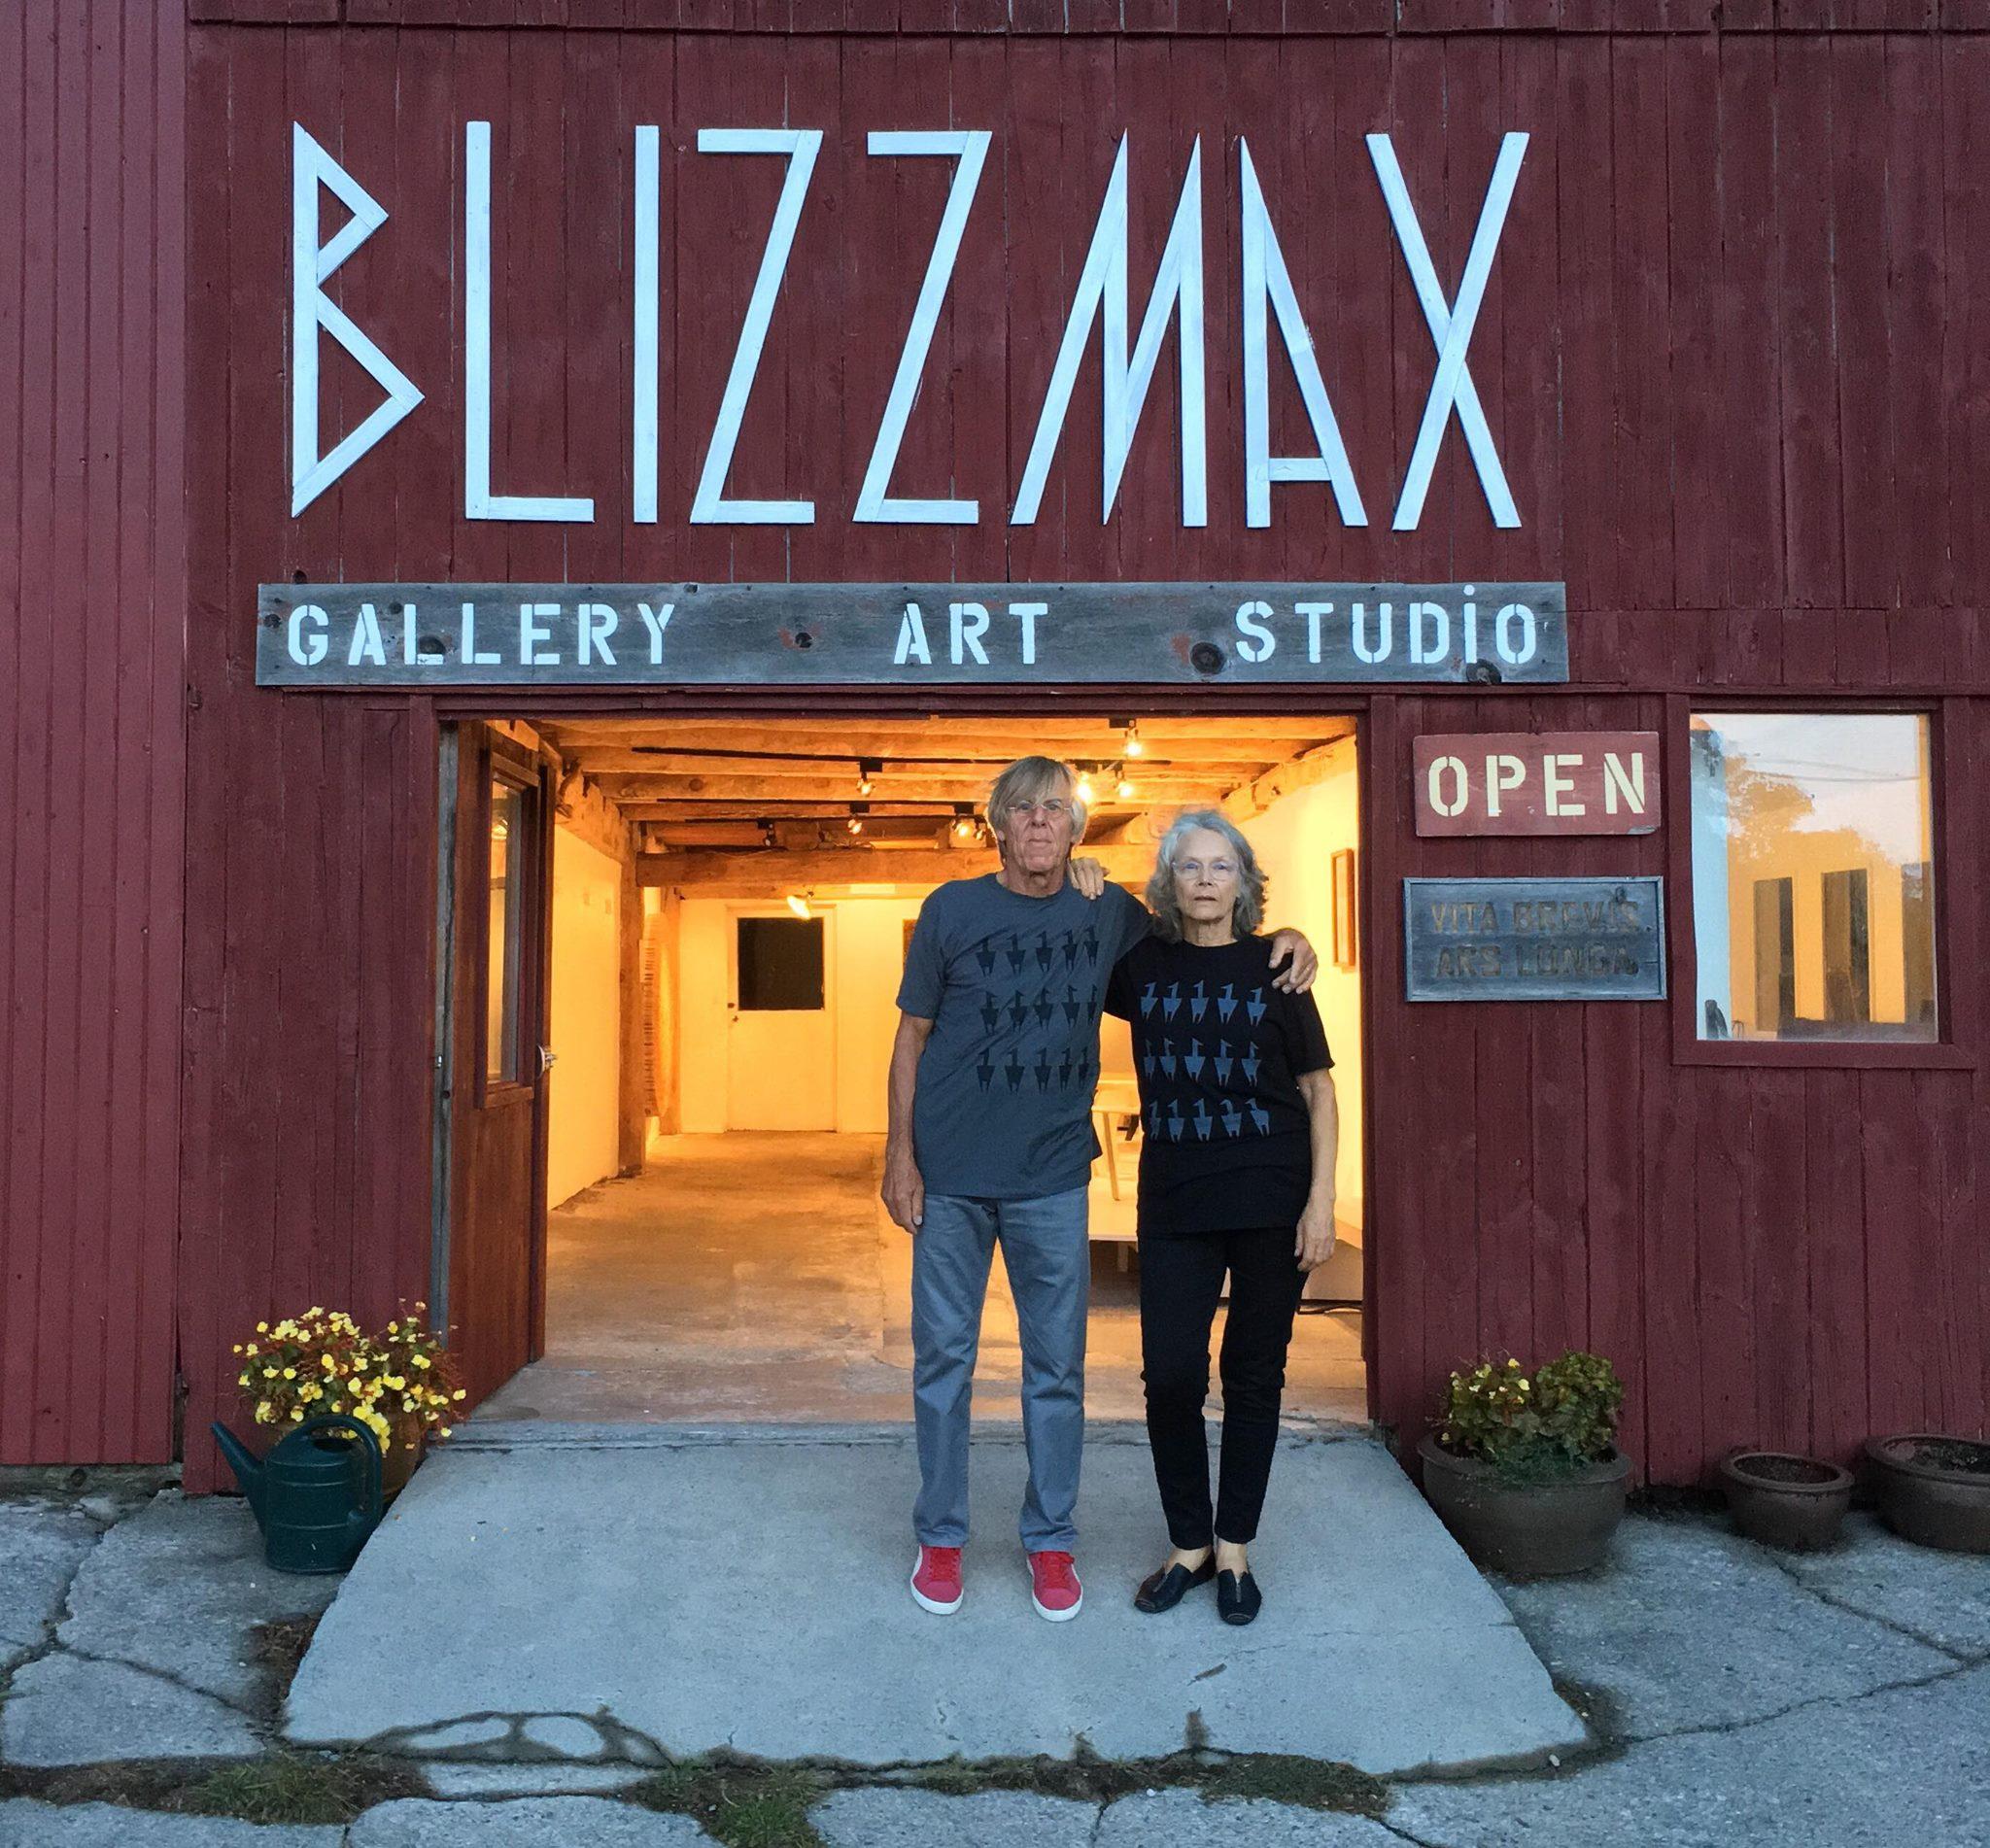 Blizz Max Gallery.jpg